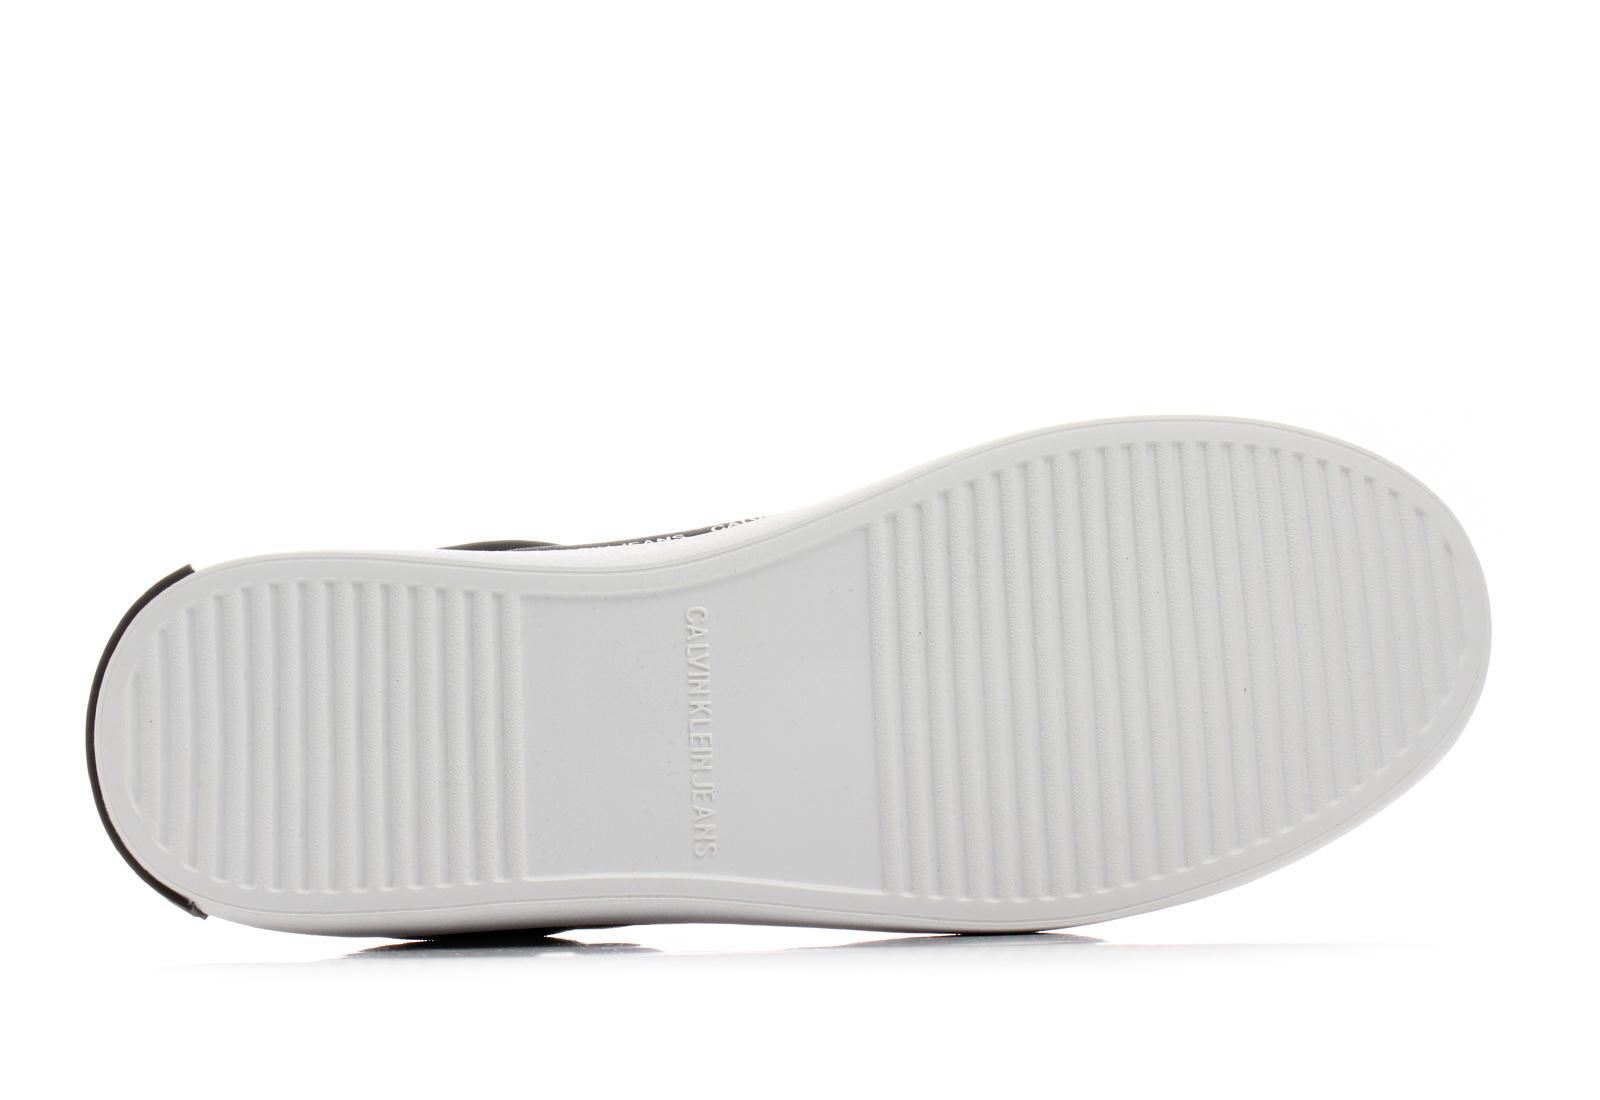 Calvin Klein Jeans Cipő - Donald - S0574-maq - Office Shoes Magyarország a480f926c3